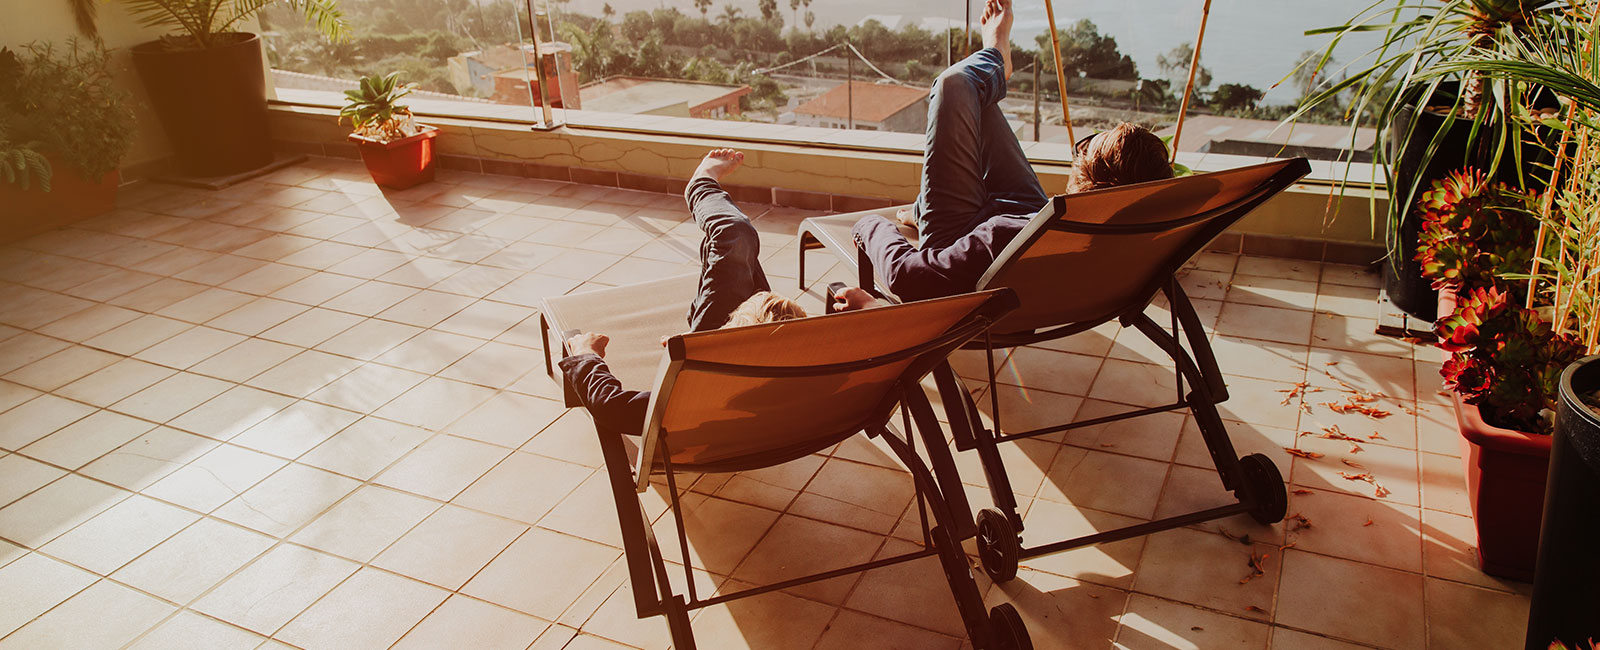 sonne balkon entspannen liegestuhl